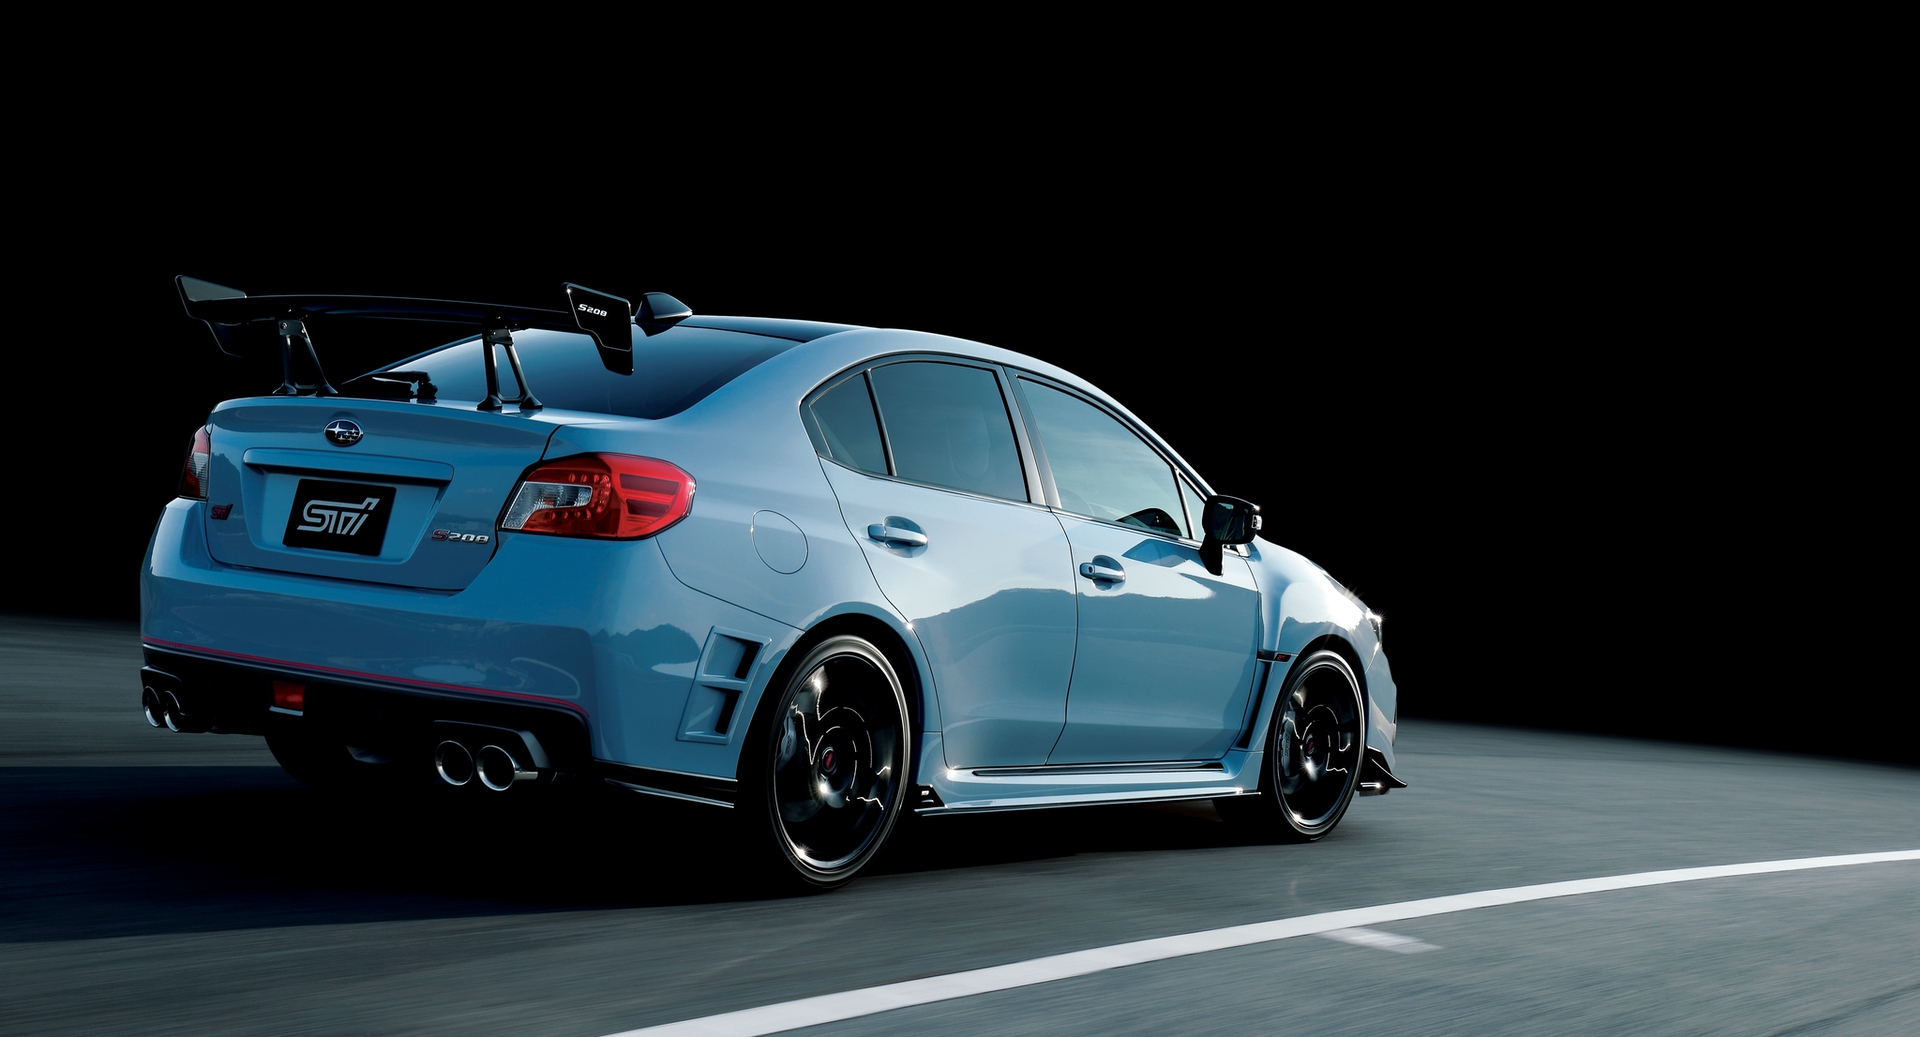 Subaru_WRX_STI_S208_NBR_Challenge_Package_0004